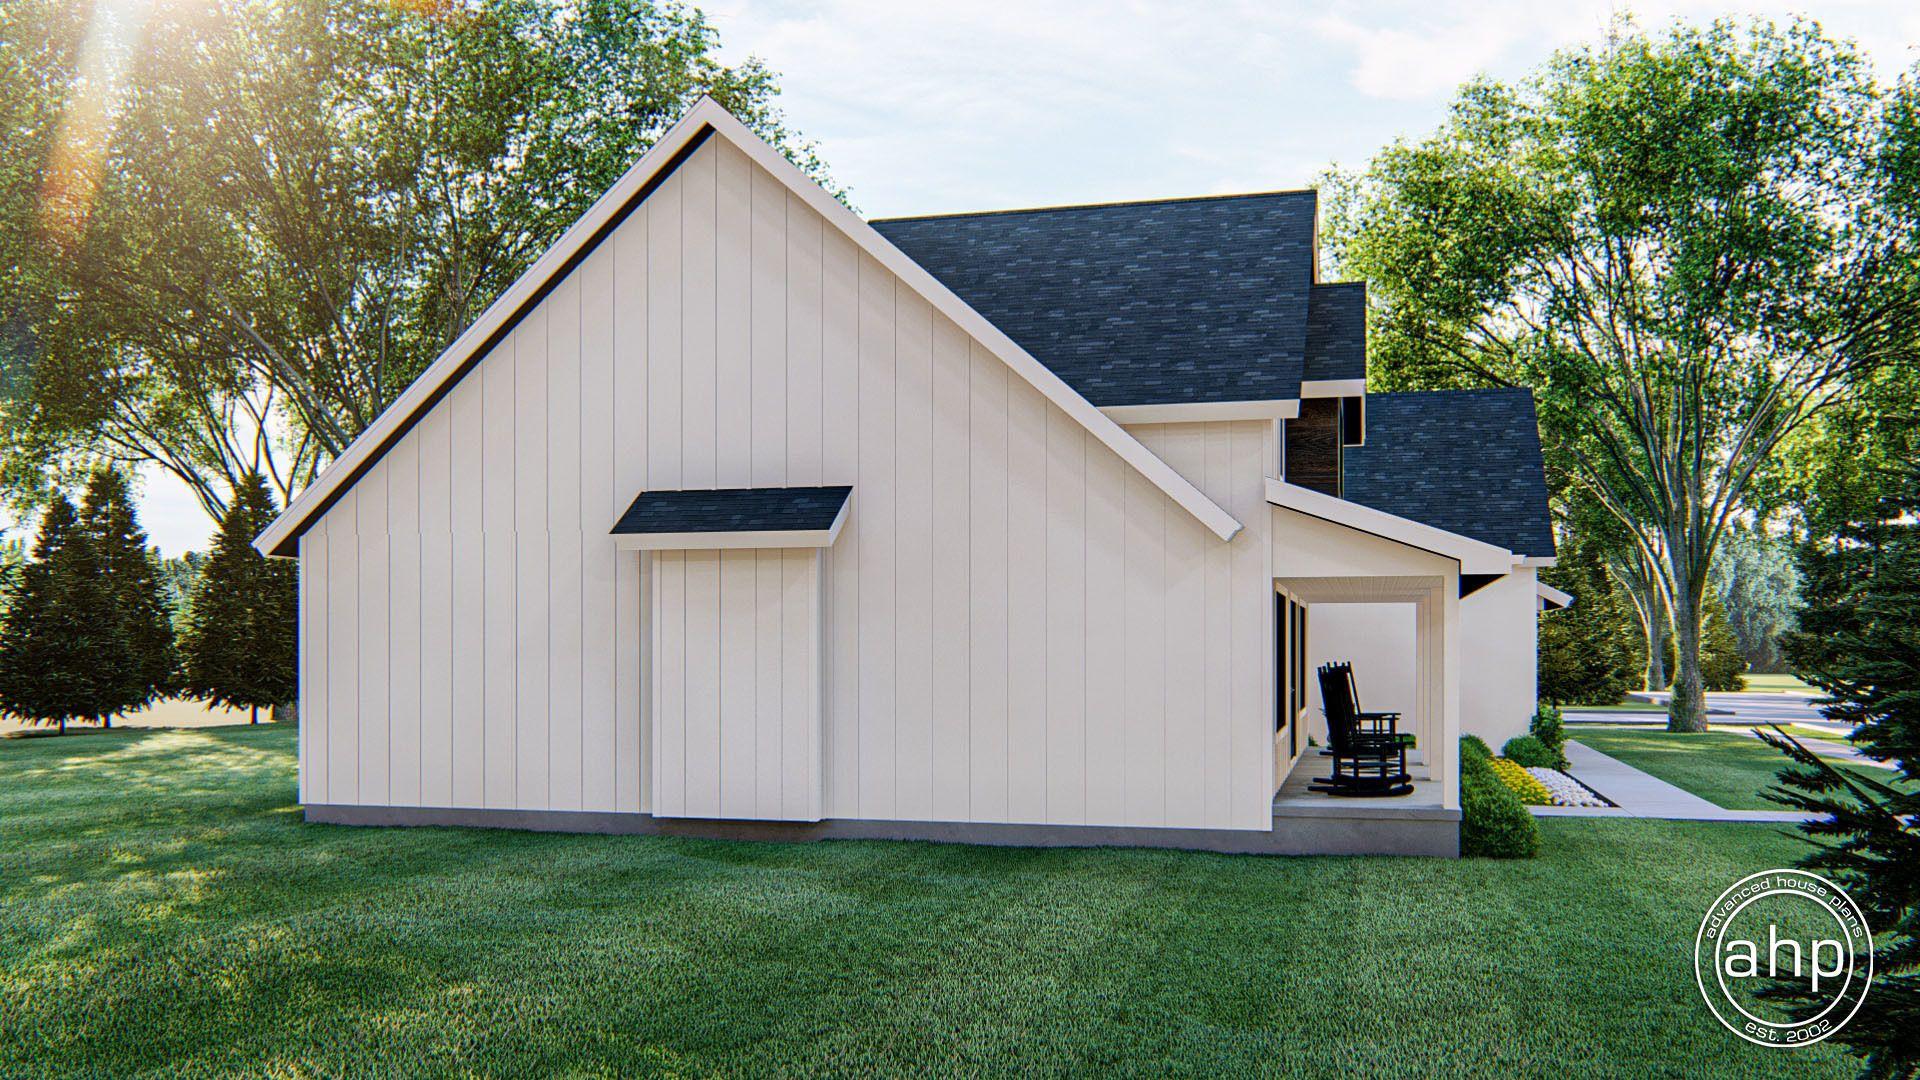 1 Story Modern Farmhouse Plan Woodcliff in 2020 Modern